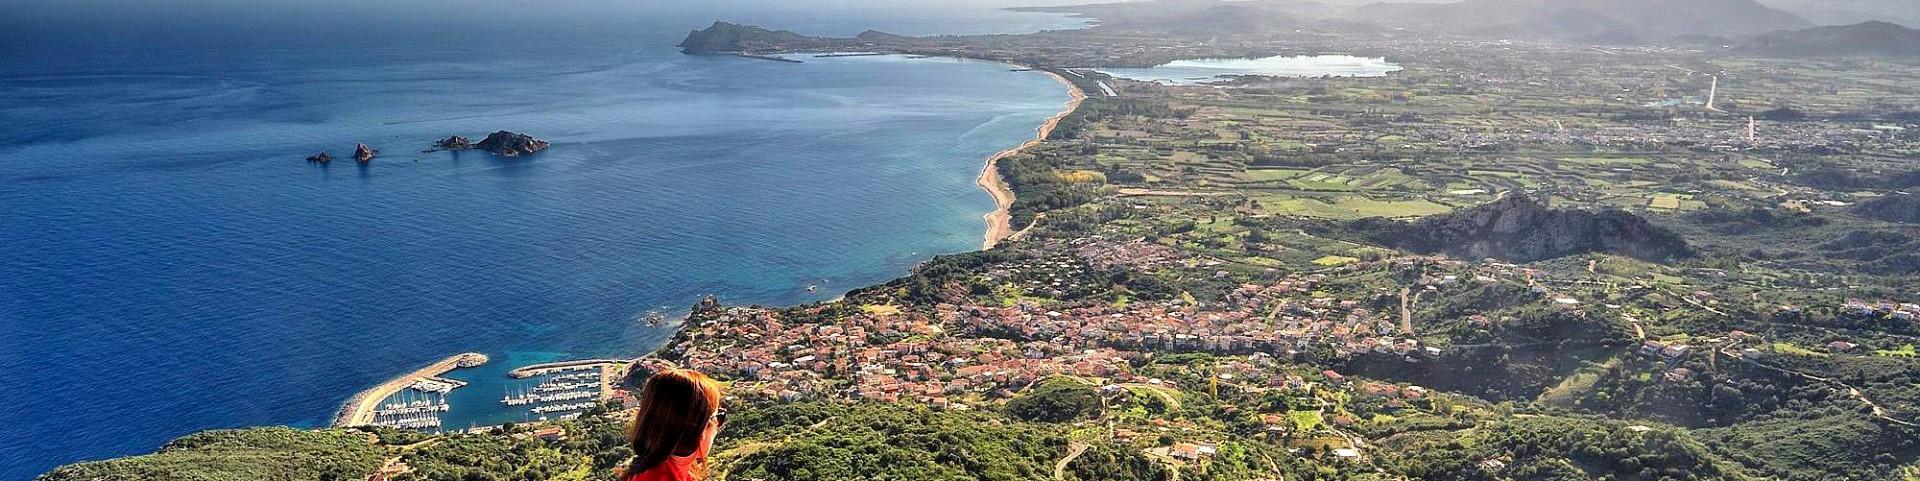 Santa Maria Navarrese, celkový pohled přes Lotzorai až po Arbatax